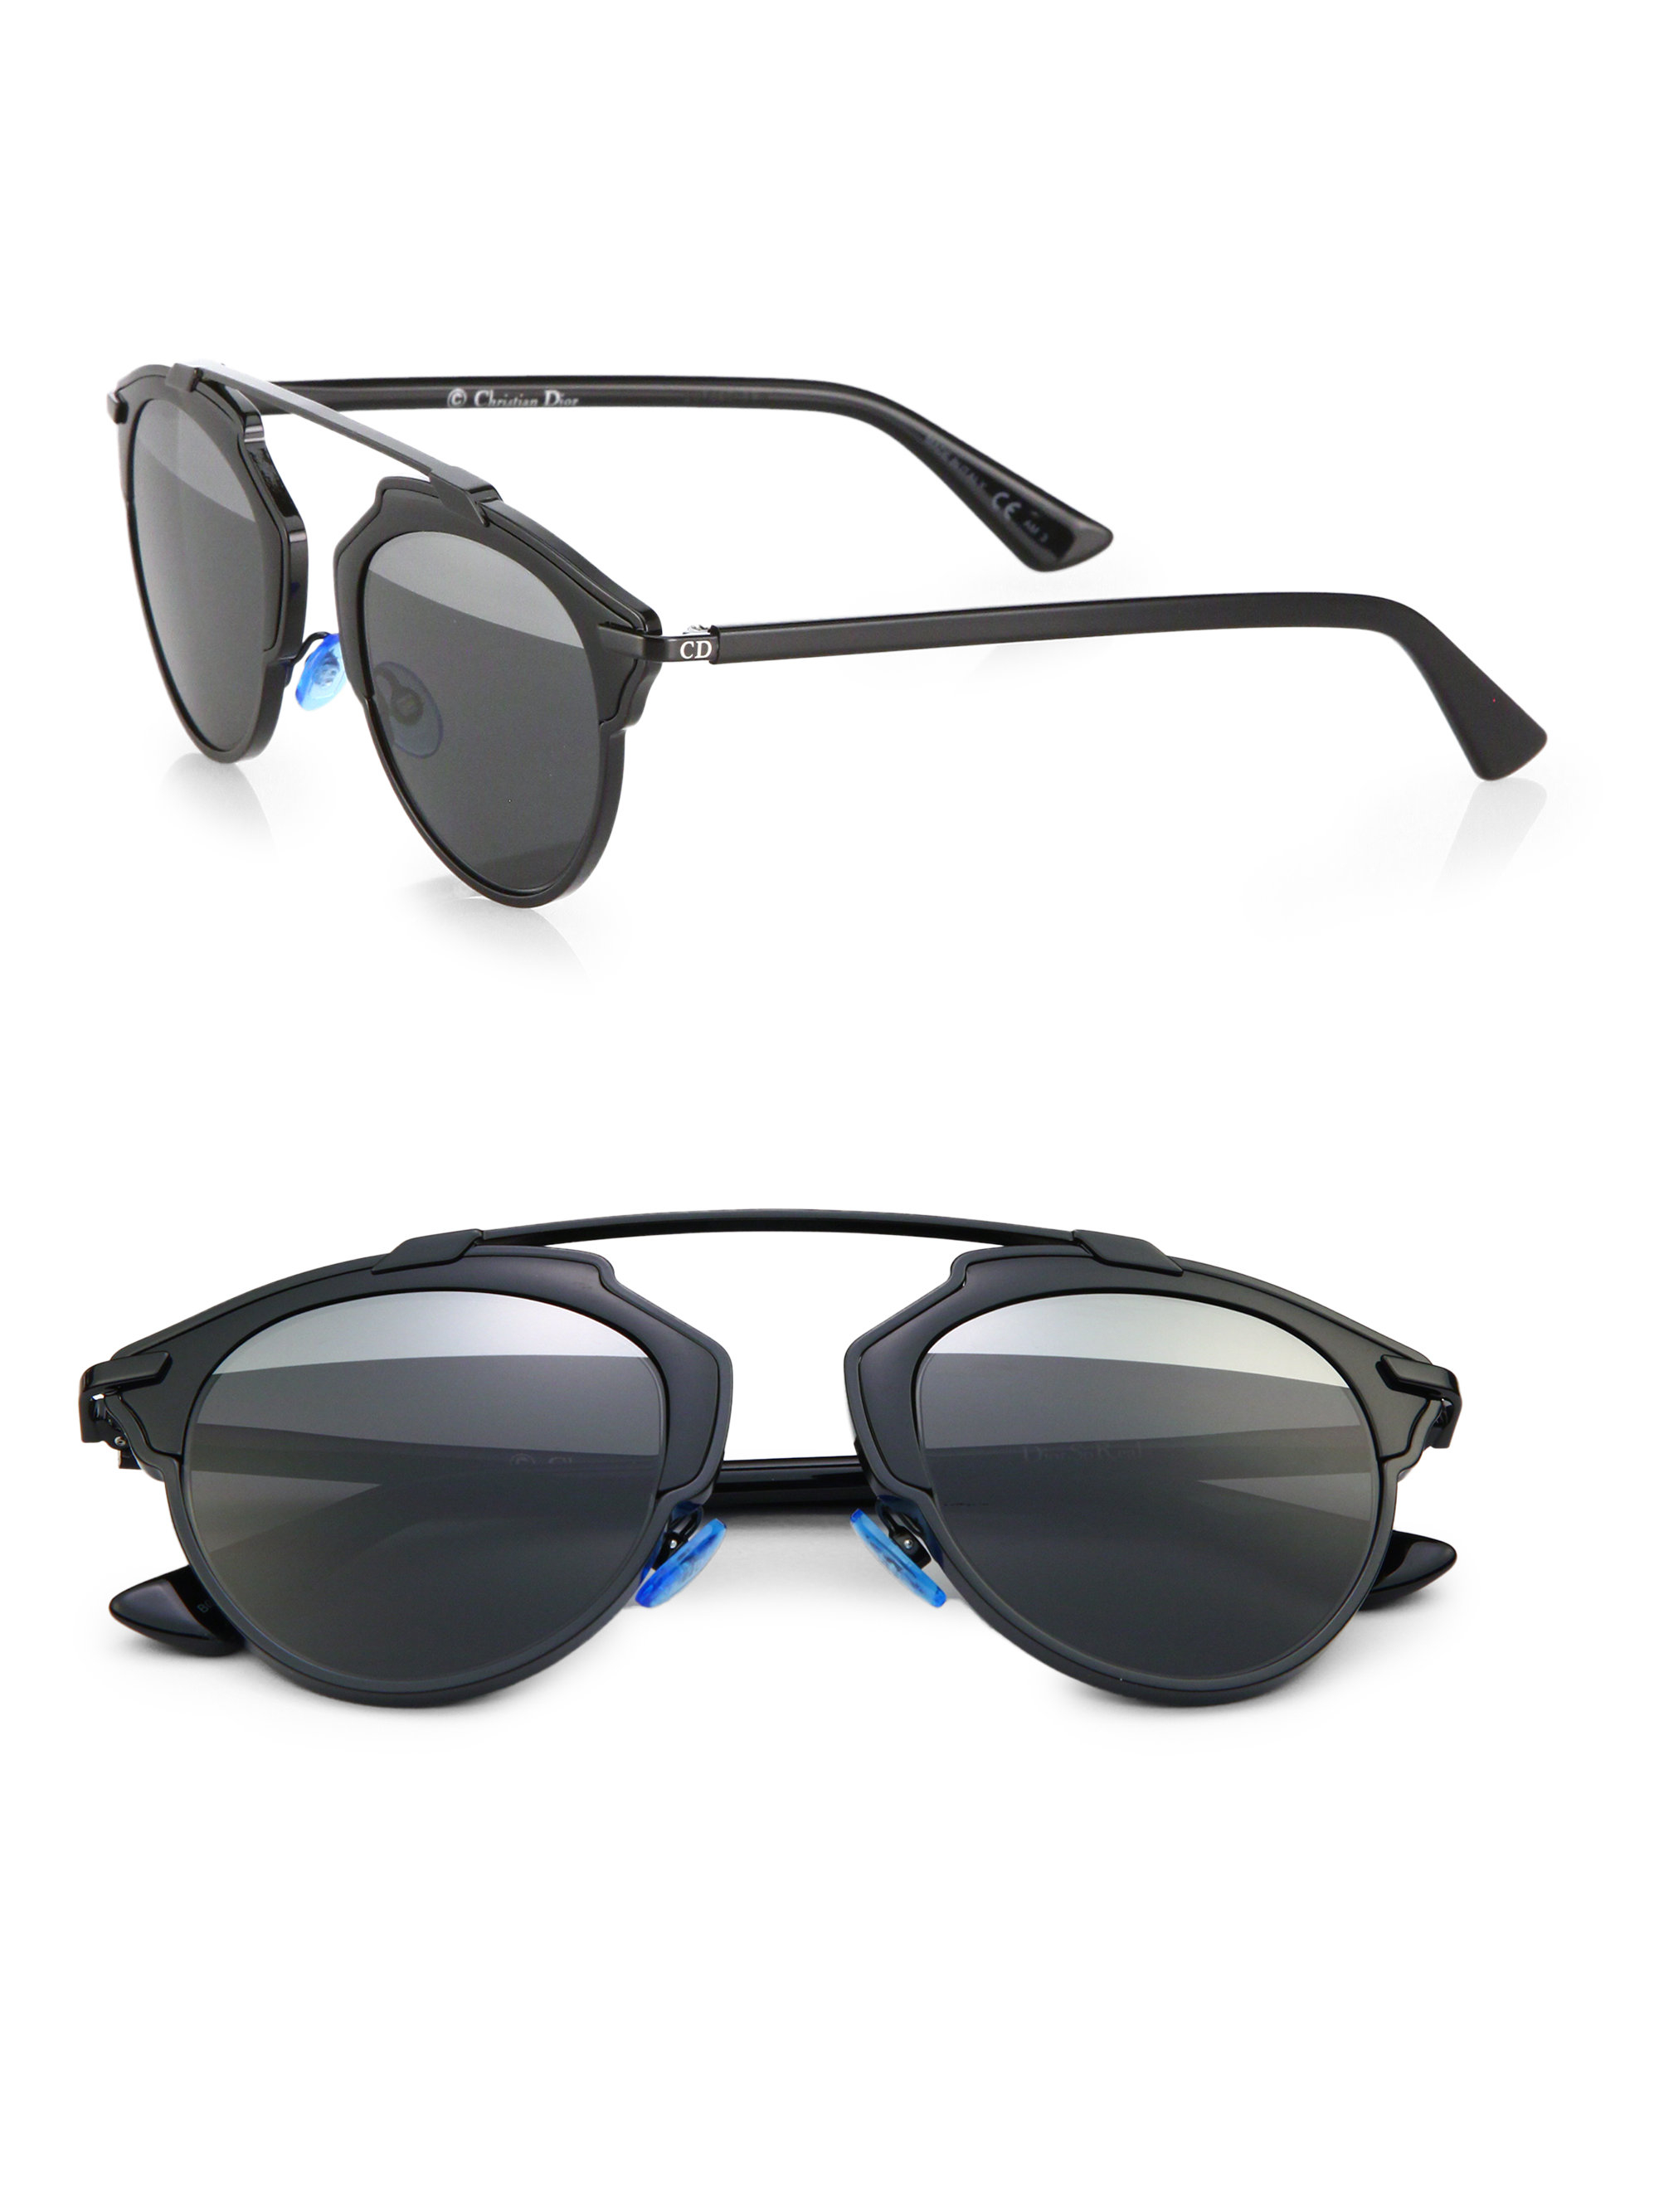 Dior Sunglasses Black  dior sunglasses black so real 6am mall com